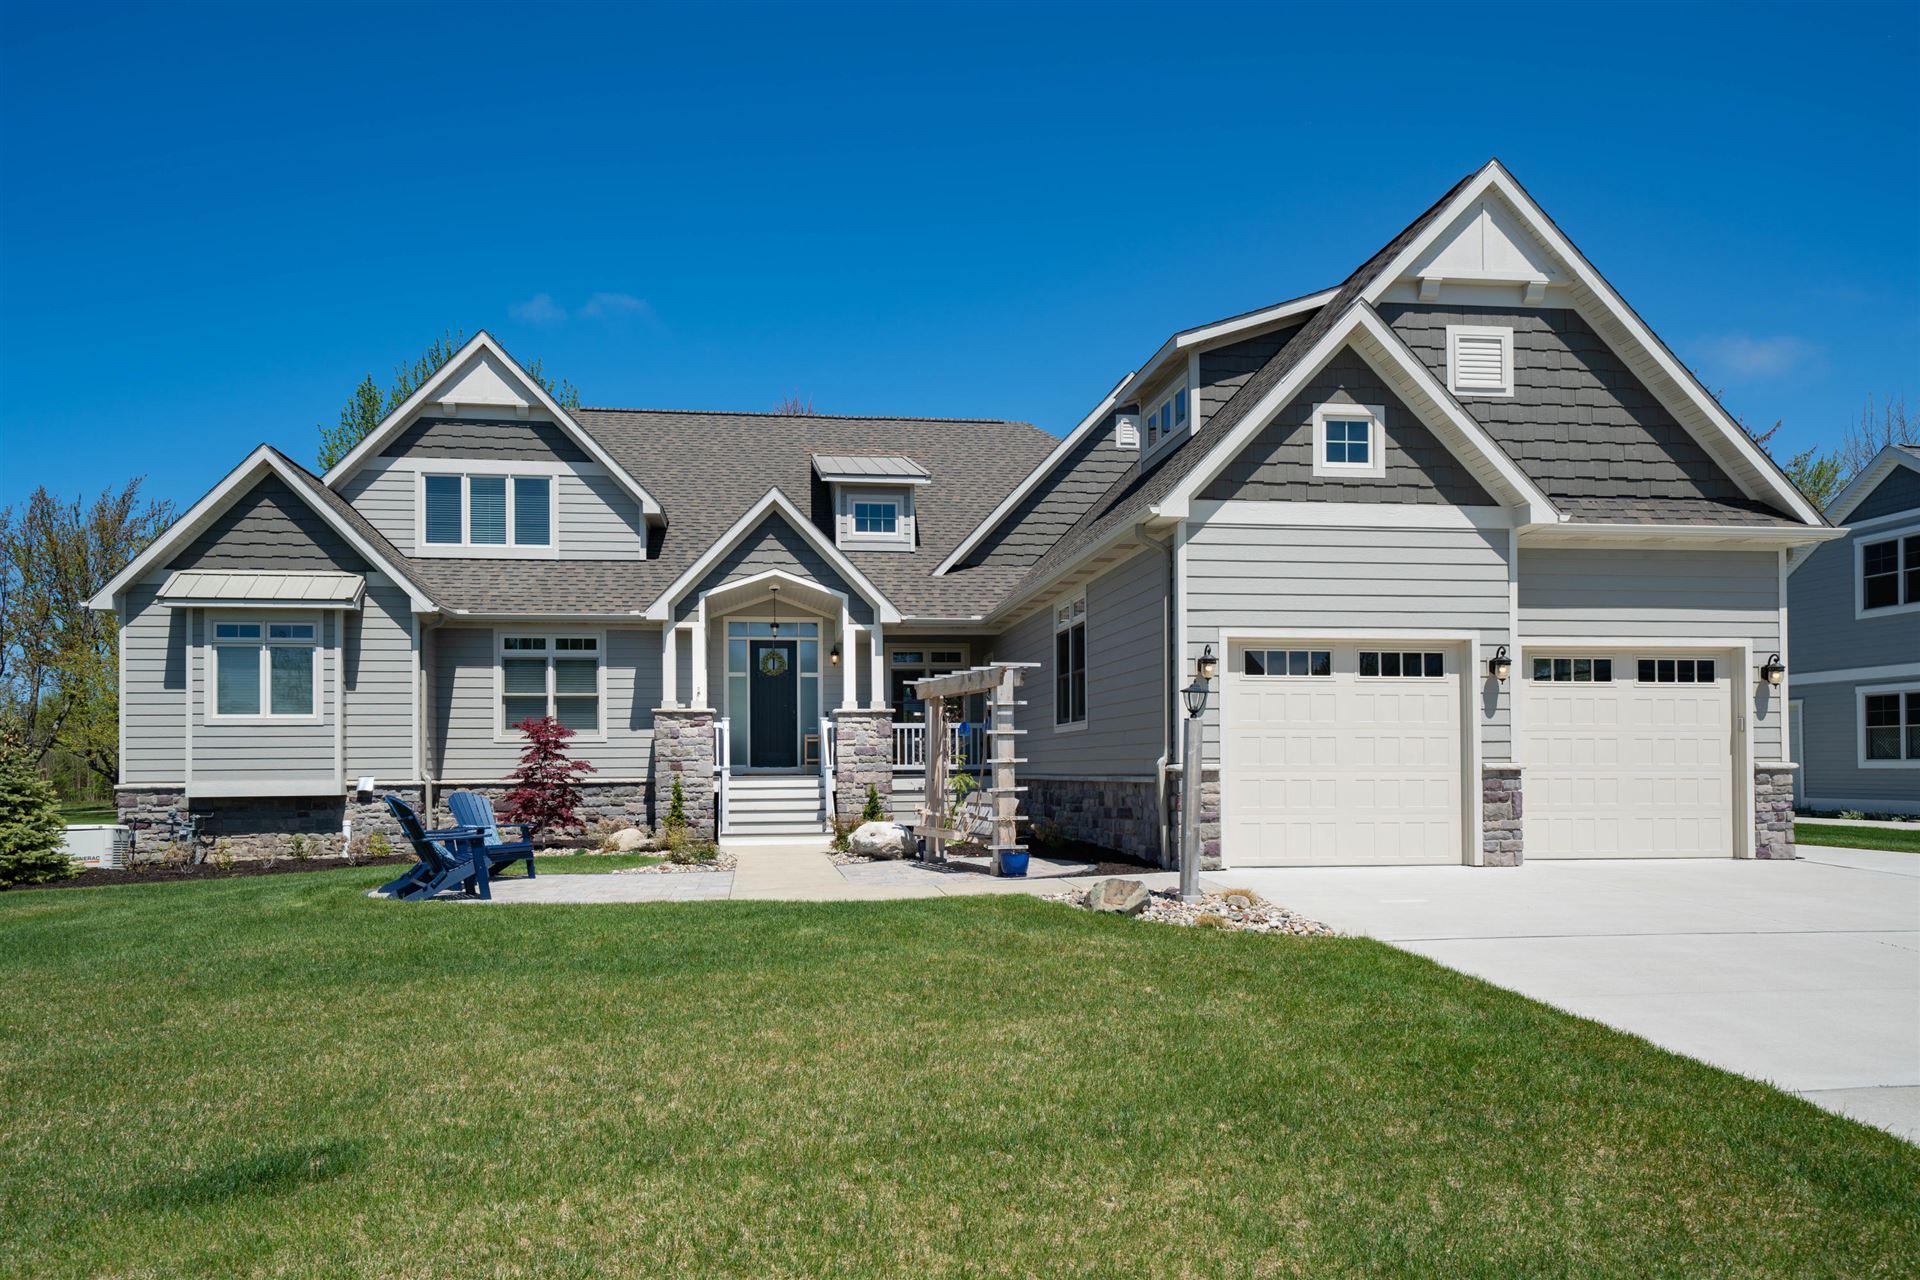 7159 Windcliff Drive, South Haven, MI 49090 - MLS#: 21016730